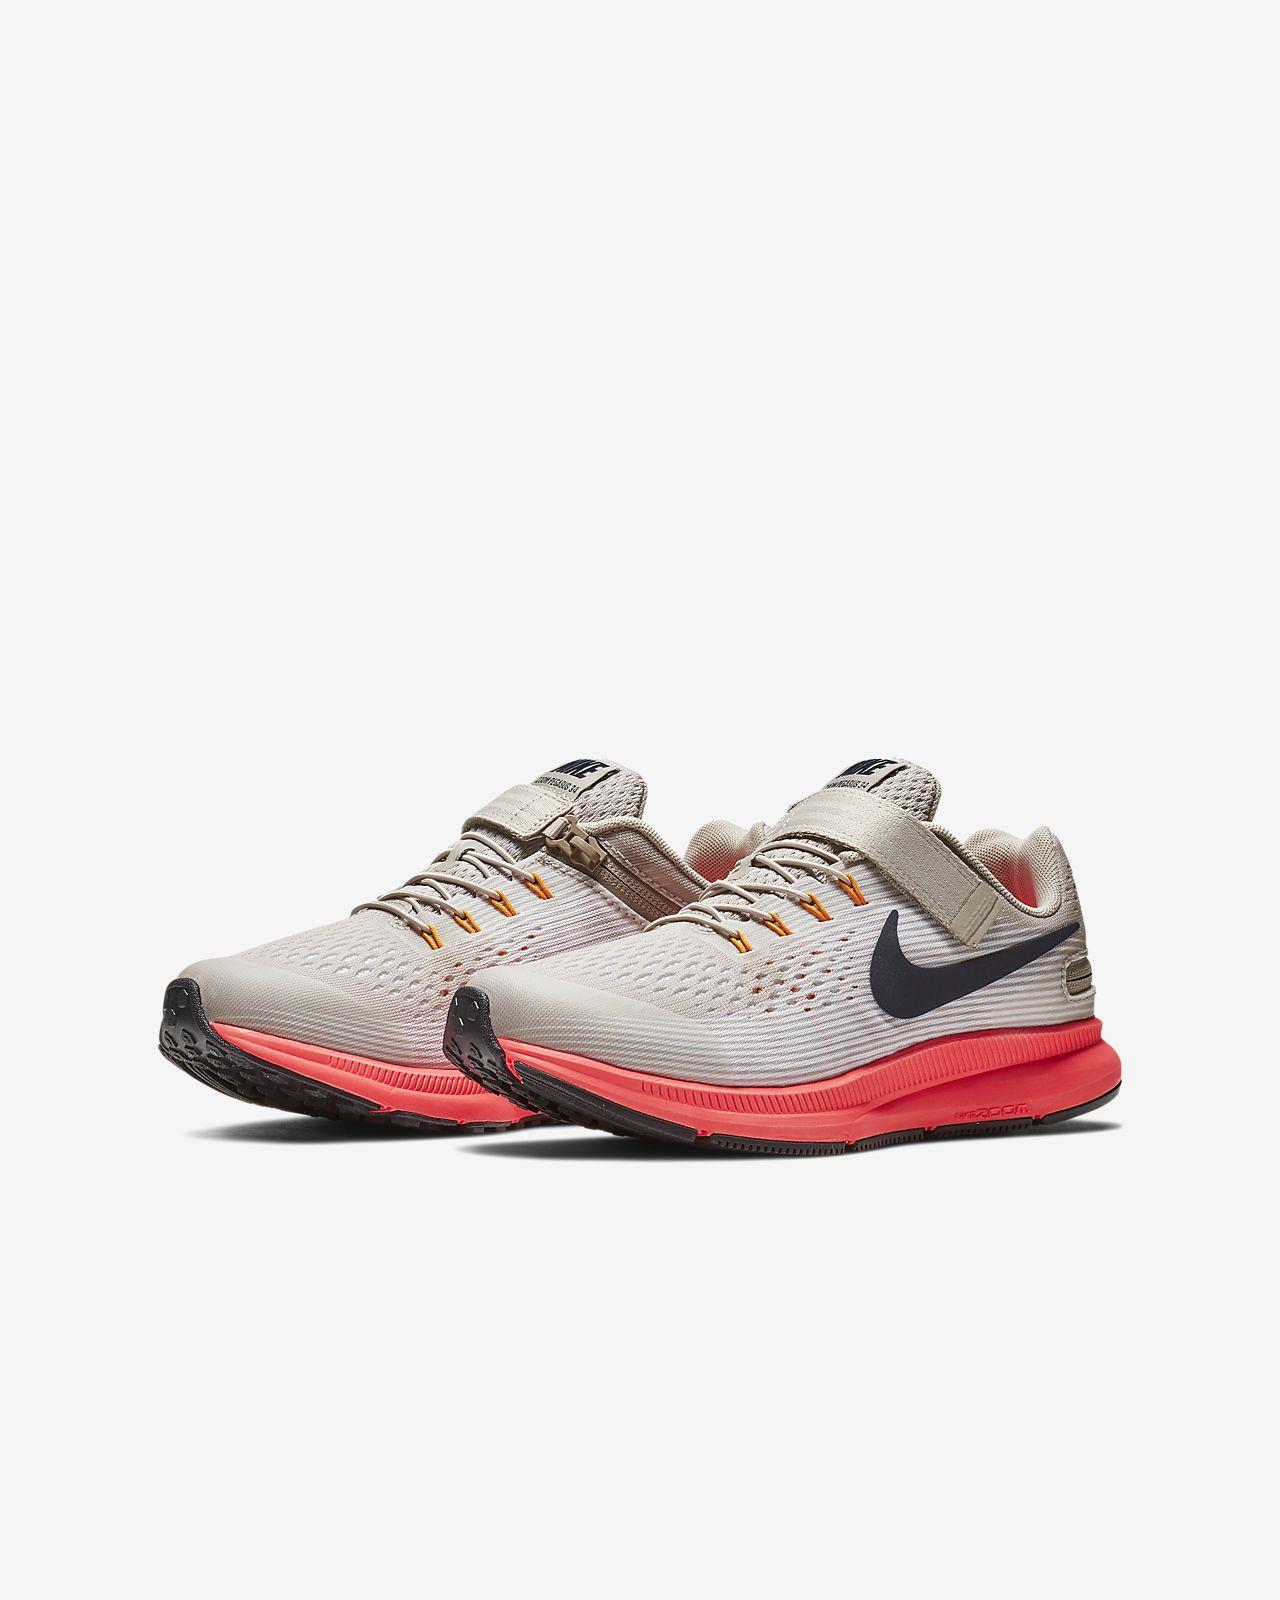 5b61a63aa5183 Nike Zoom Pegasus 34 FlyEase Little Big Kids  Running Shoe. Nike.com